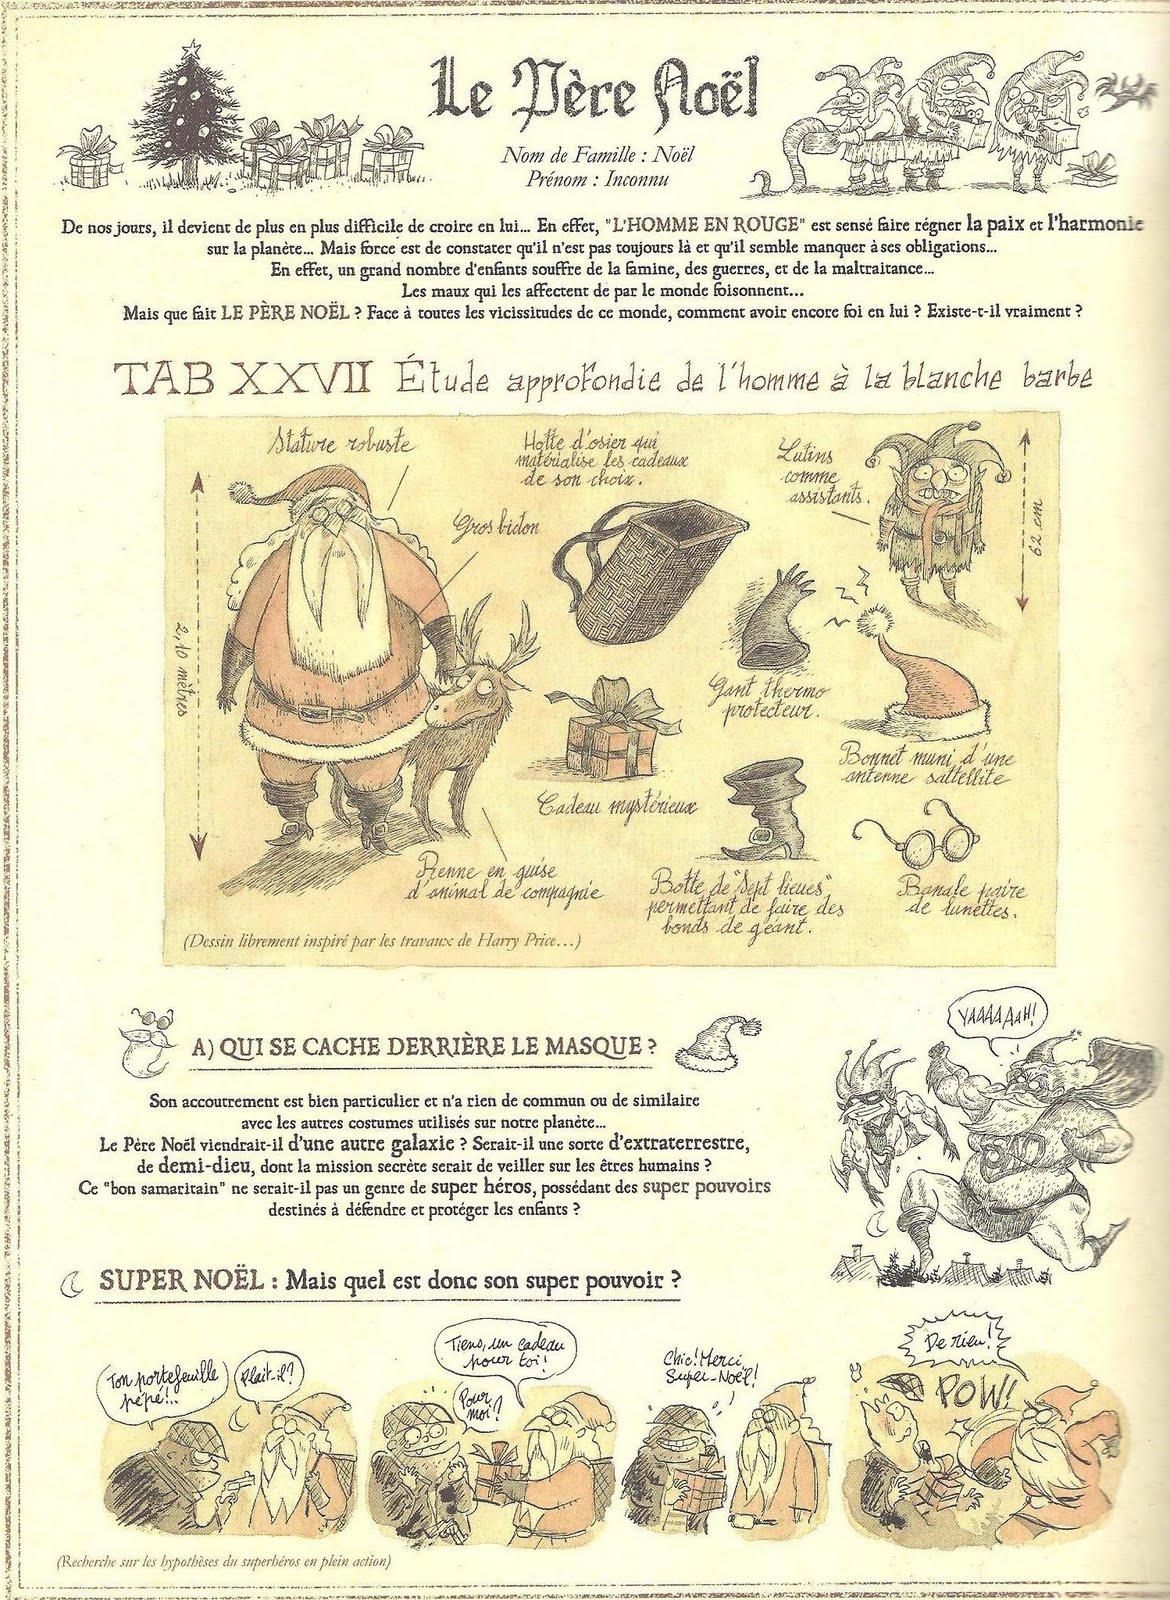 A l'Esperluette. - Page 12 Bb%2B4%2Bb